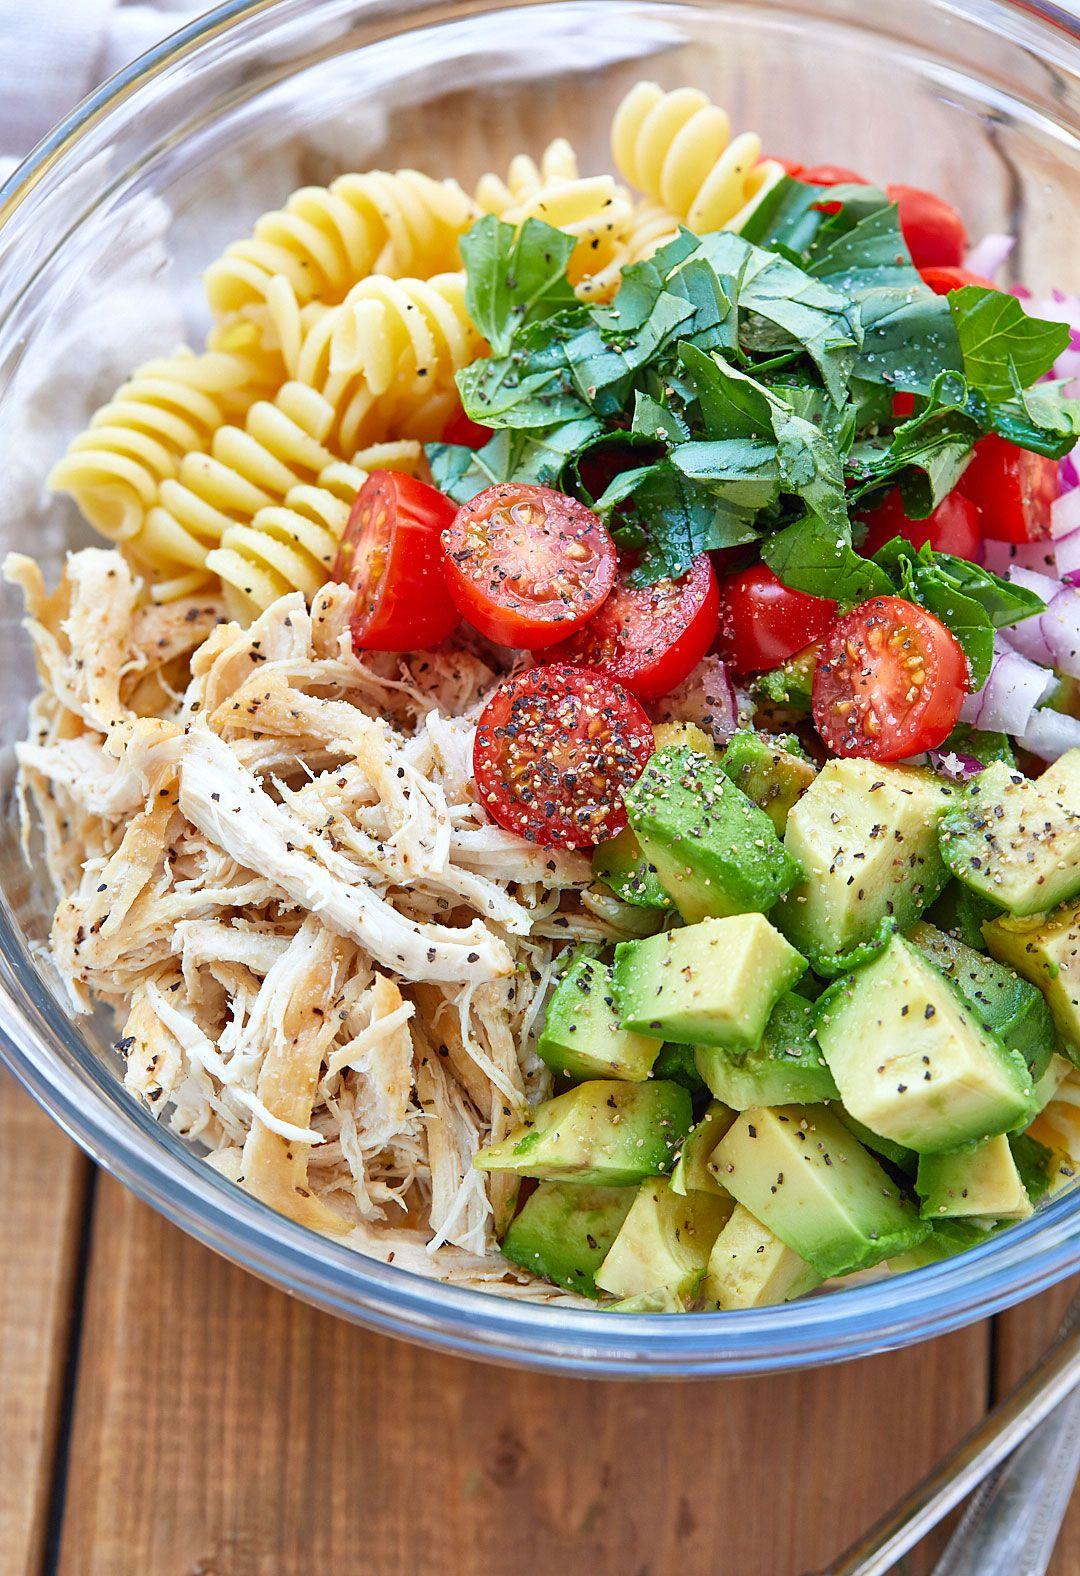 Healthy Chicken Pasta Salad with Avocado, Tomato, and Basil  -   7 healthy recipes Chicken pasta ideas